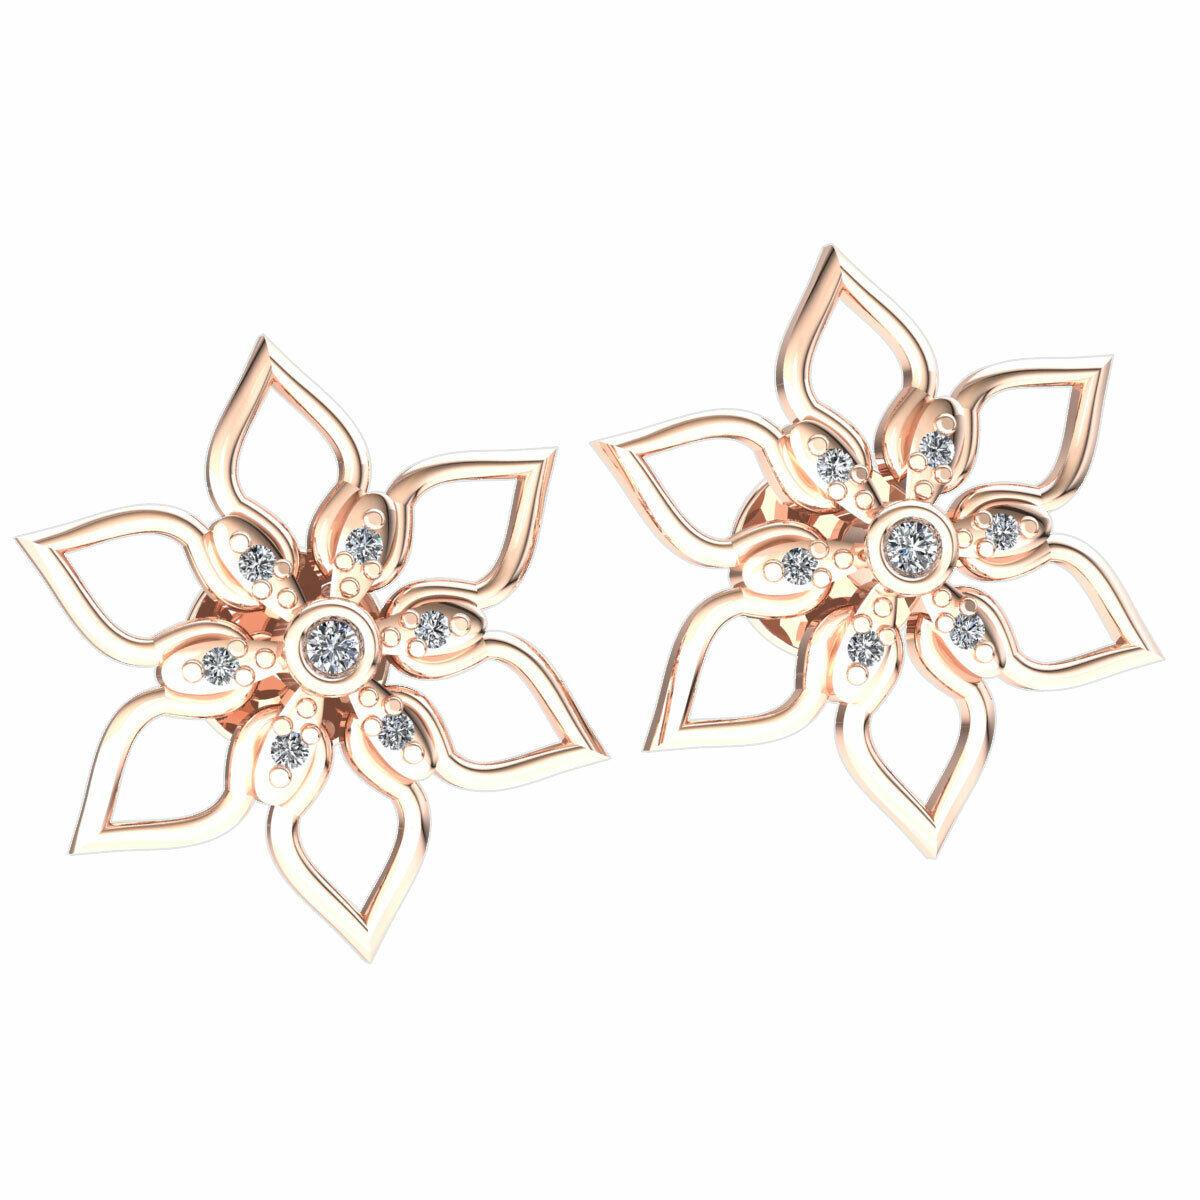 Genuine 0.05ct Round Cut Diamond Ladies 7-Stone Star Earrings Solid 18K gold